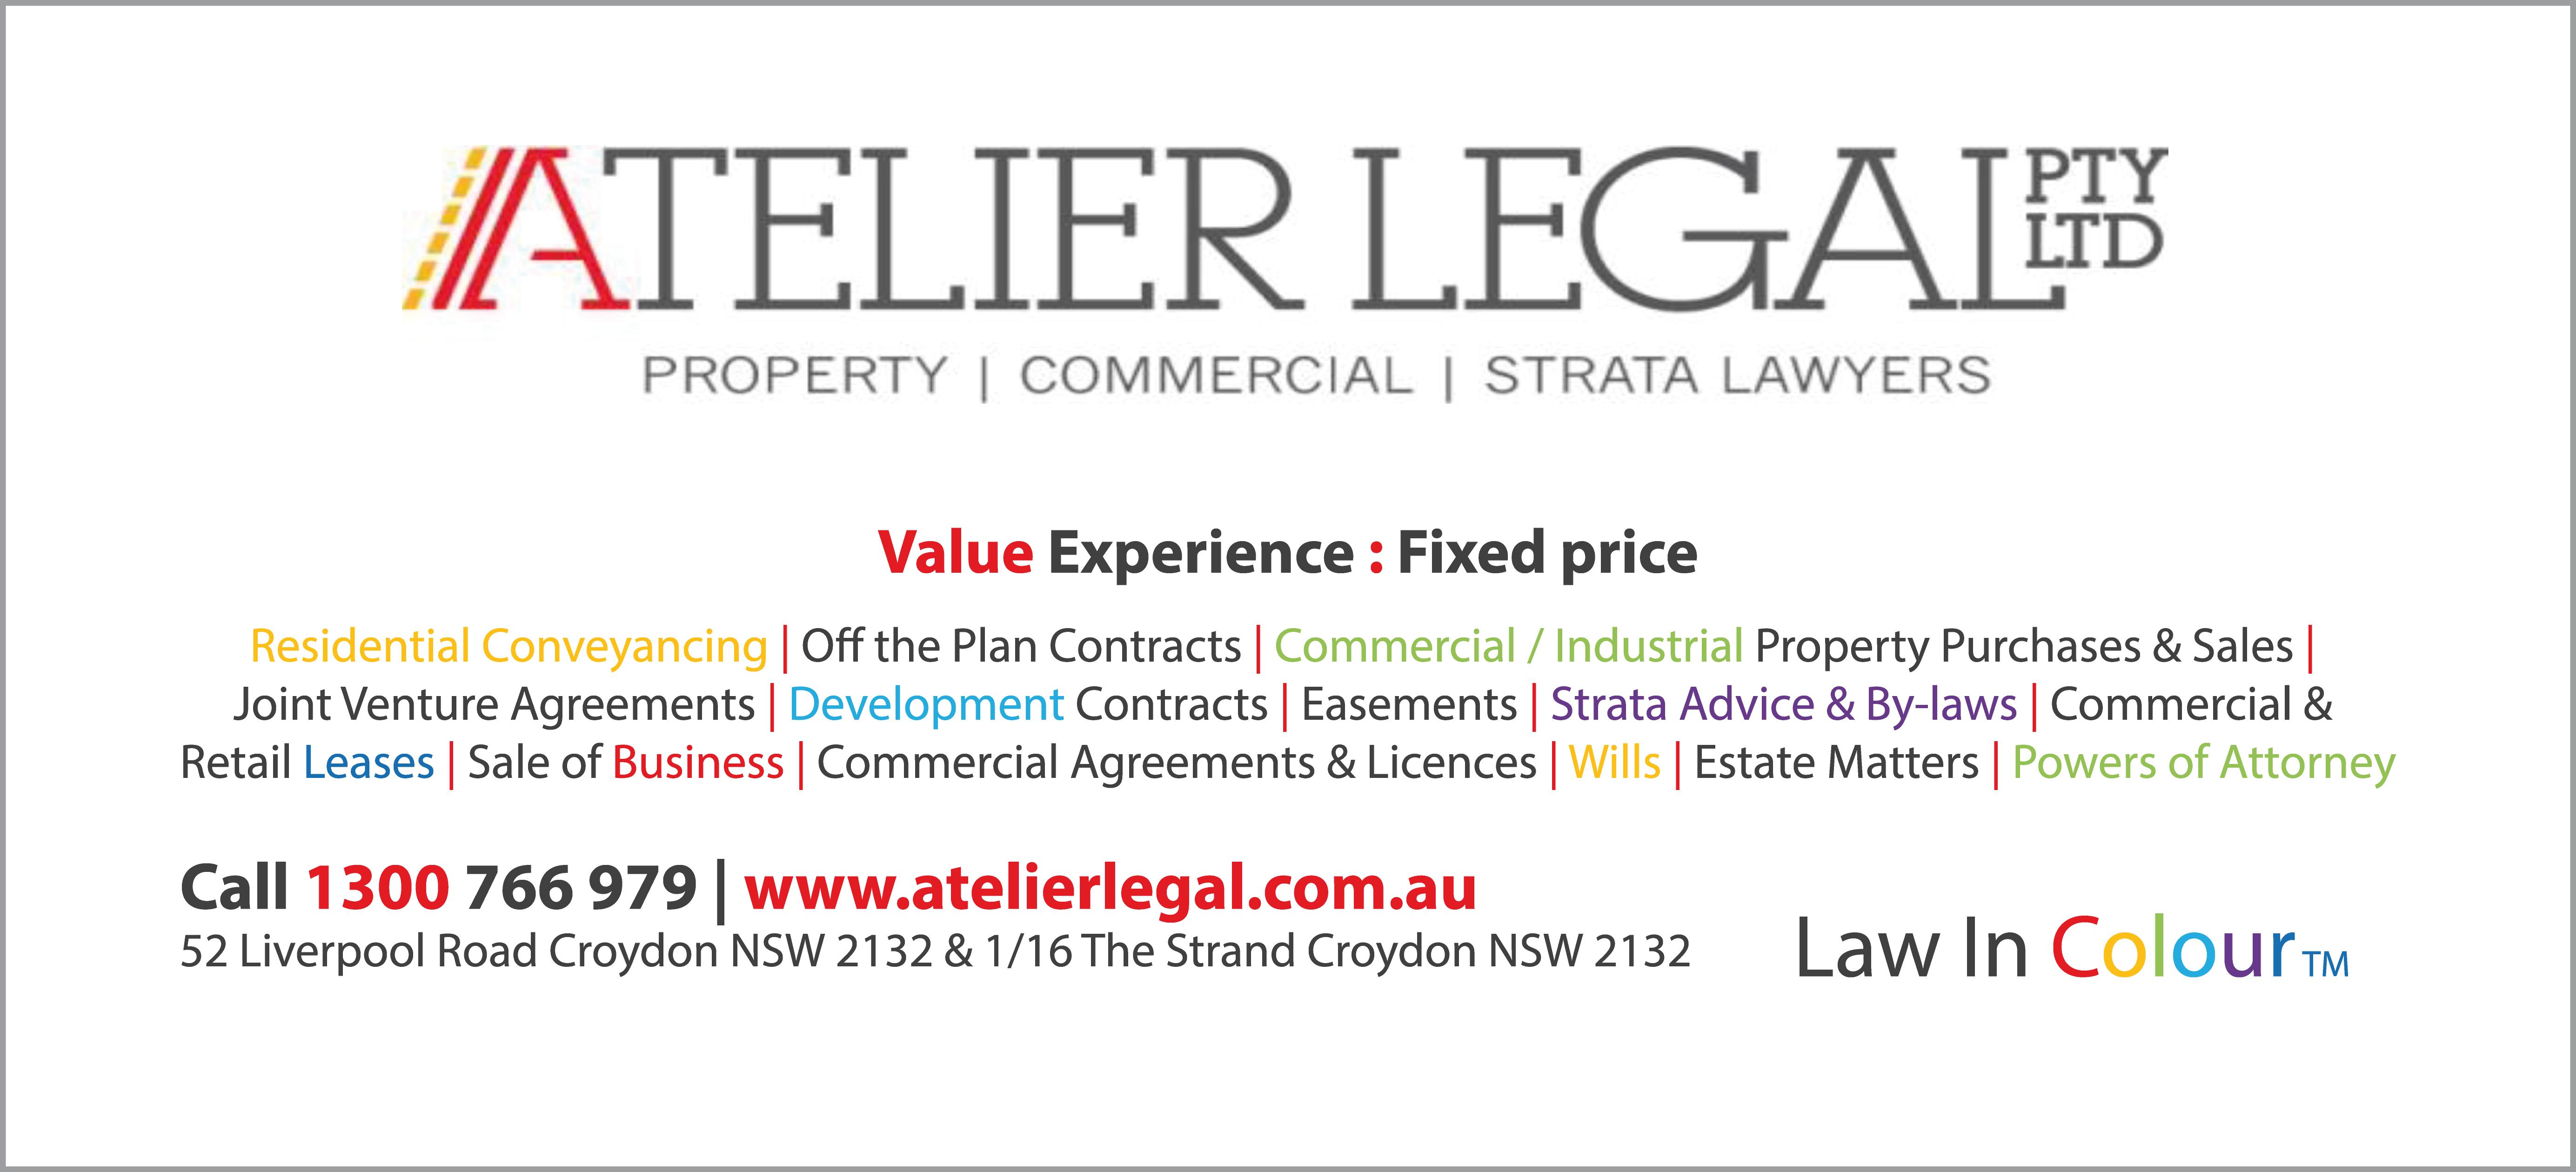 Atelier Legal